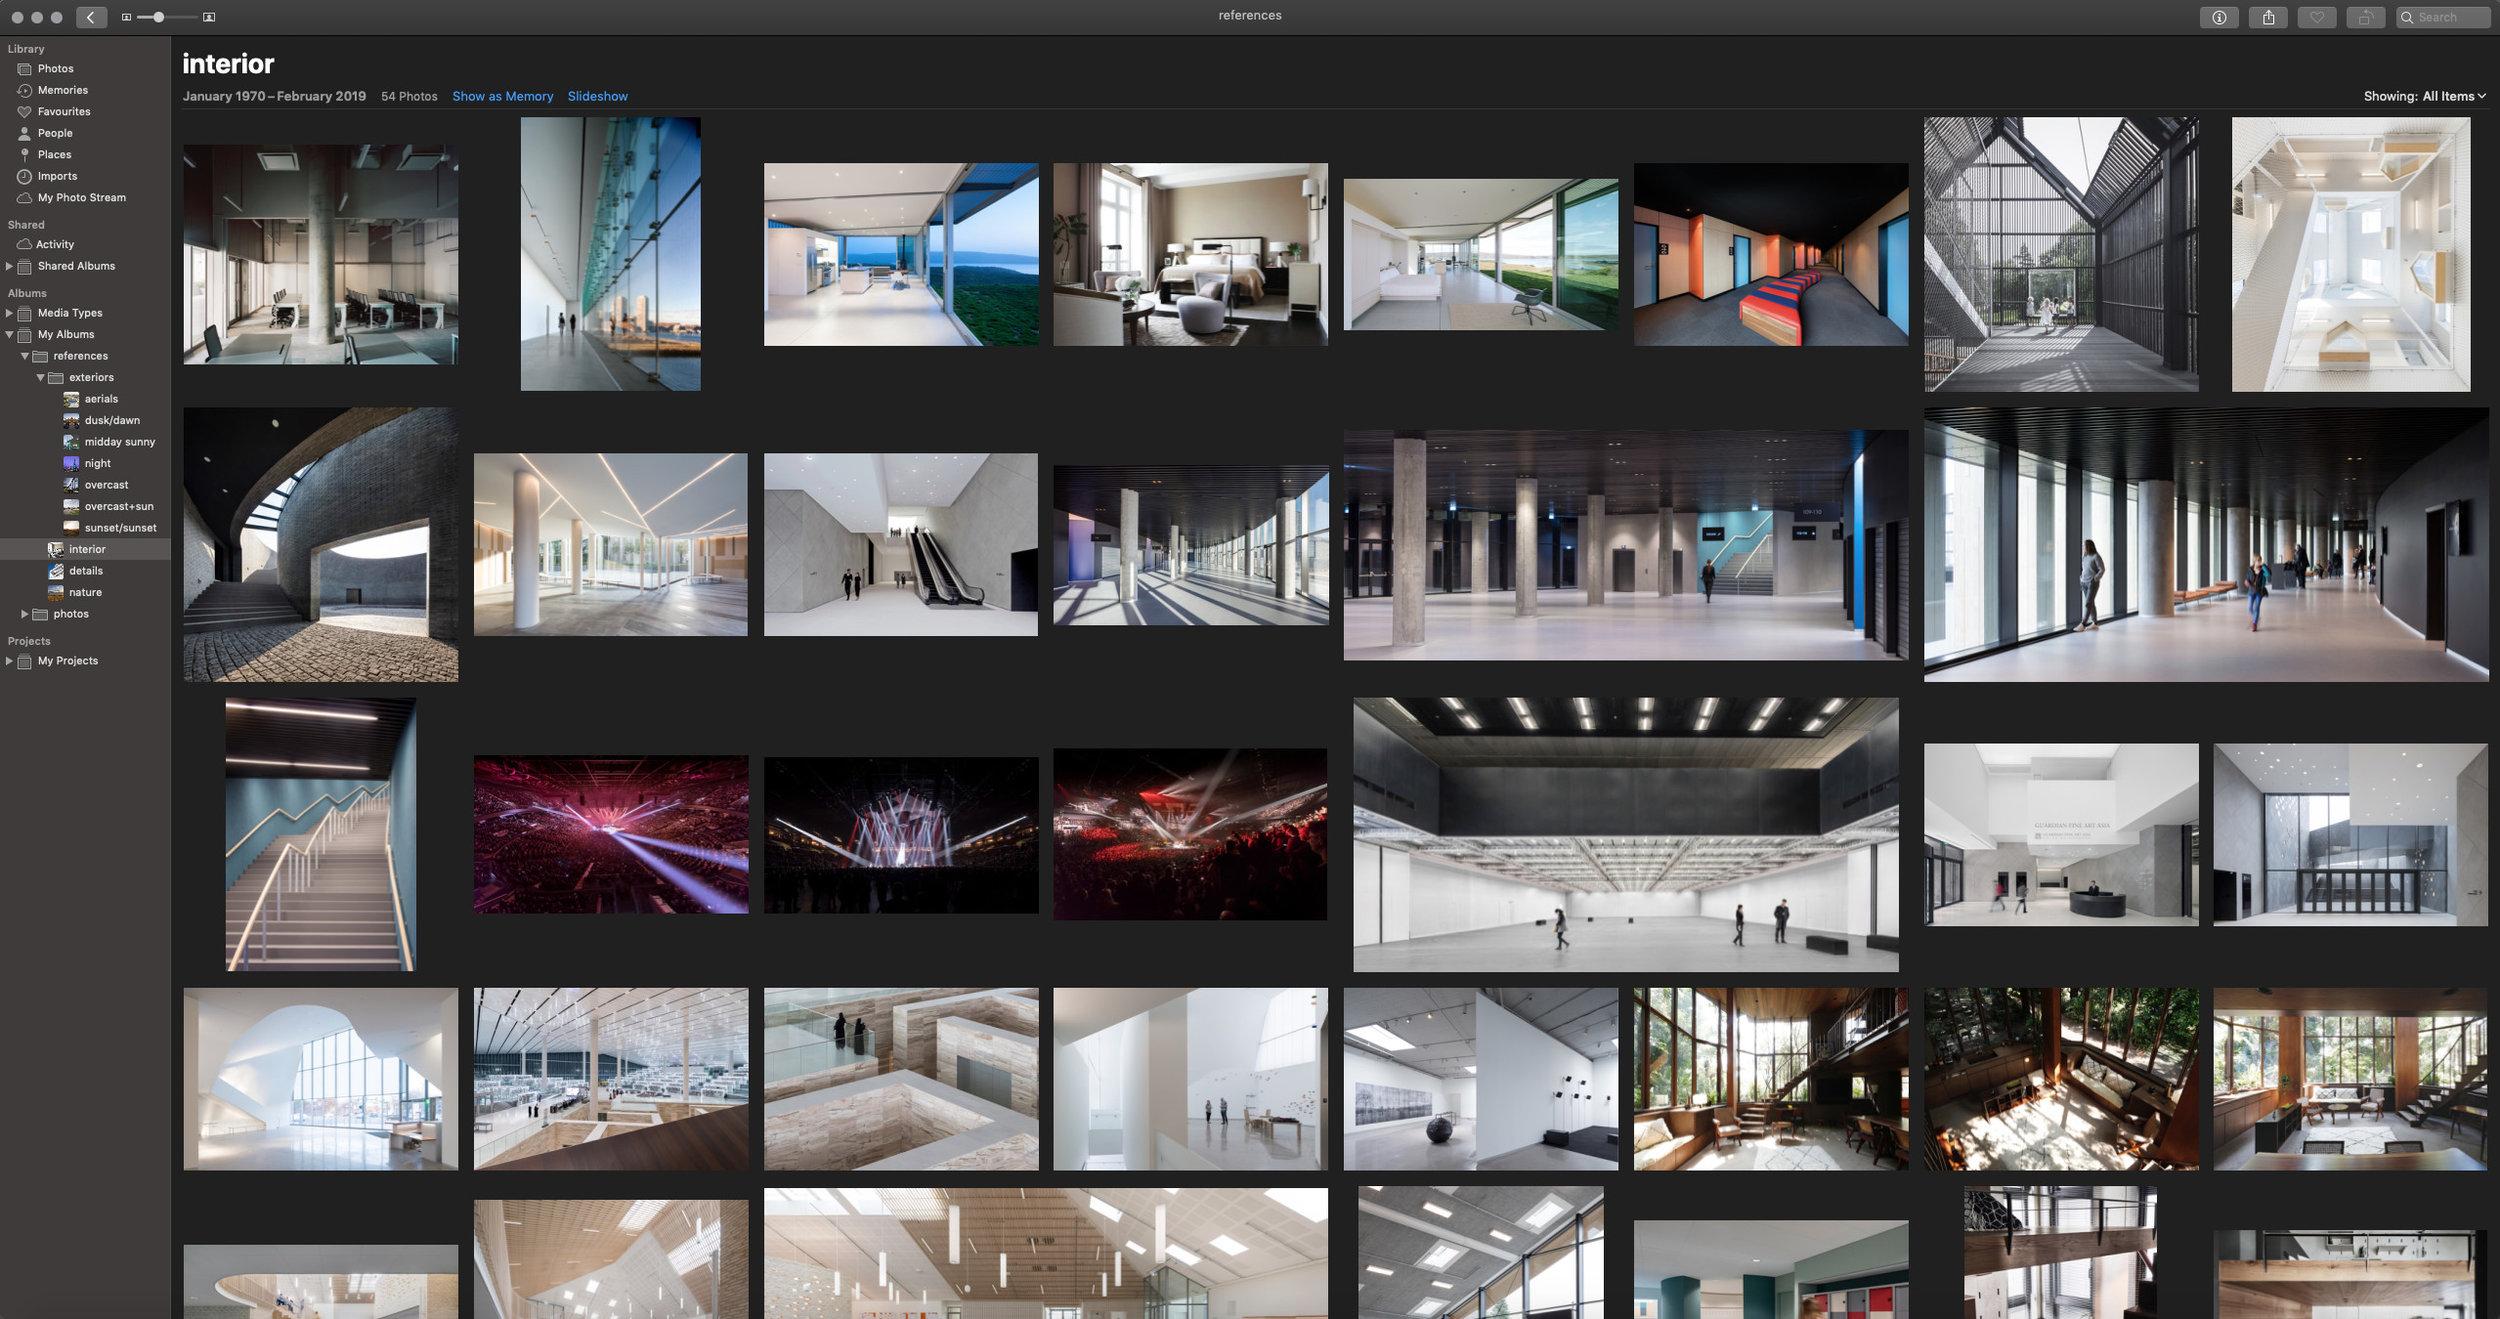 yurii-suhov-photo-references-interior.jpg